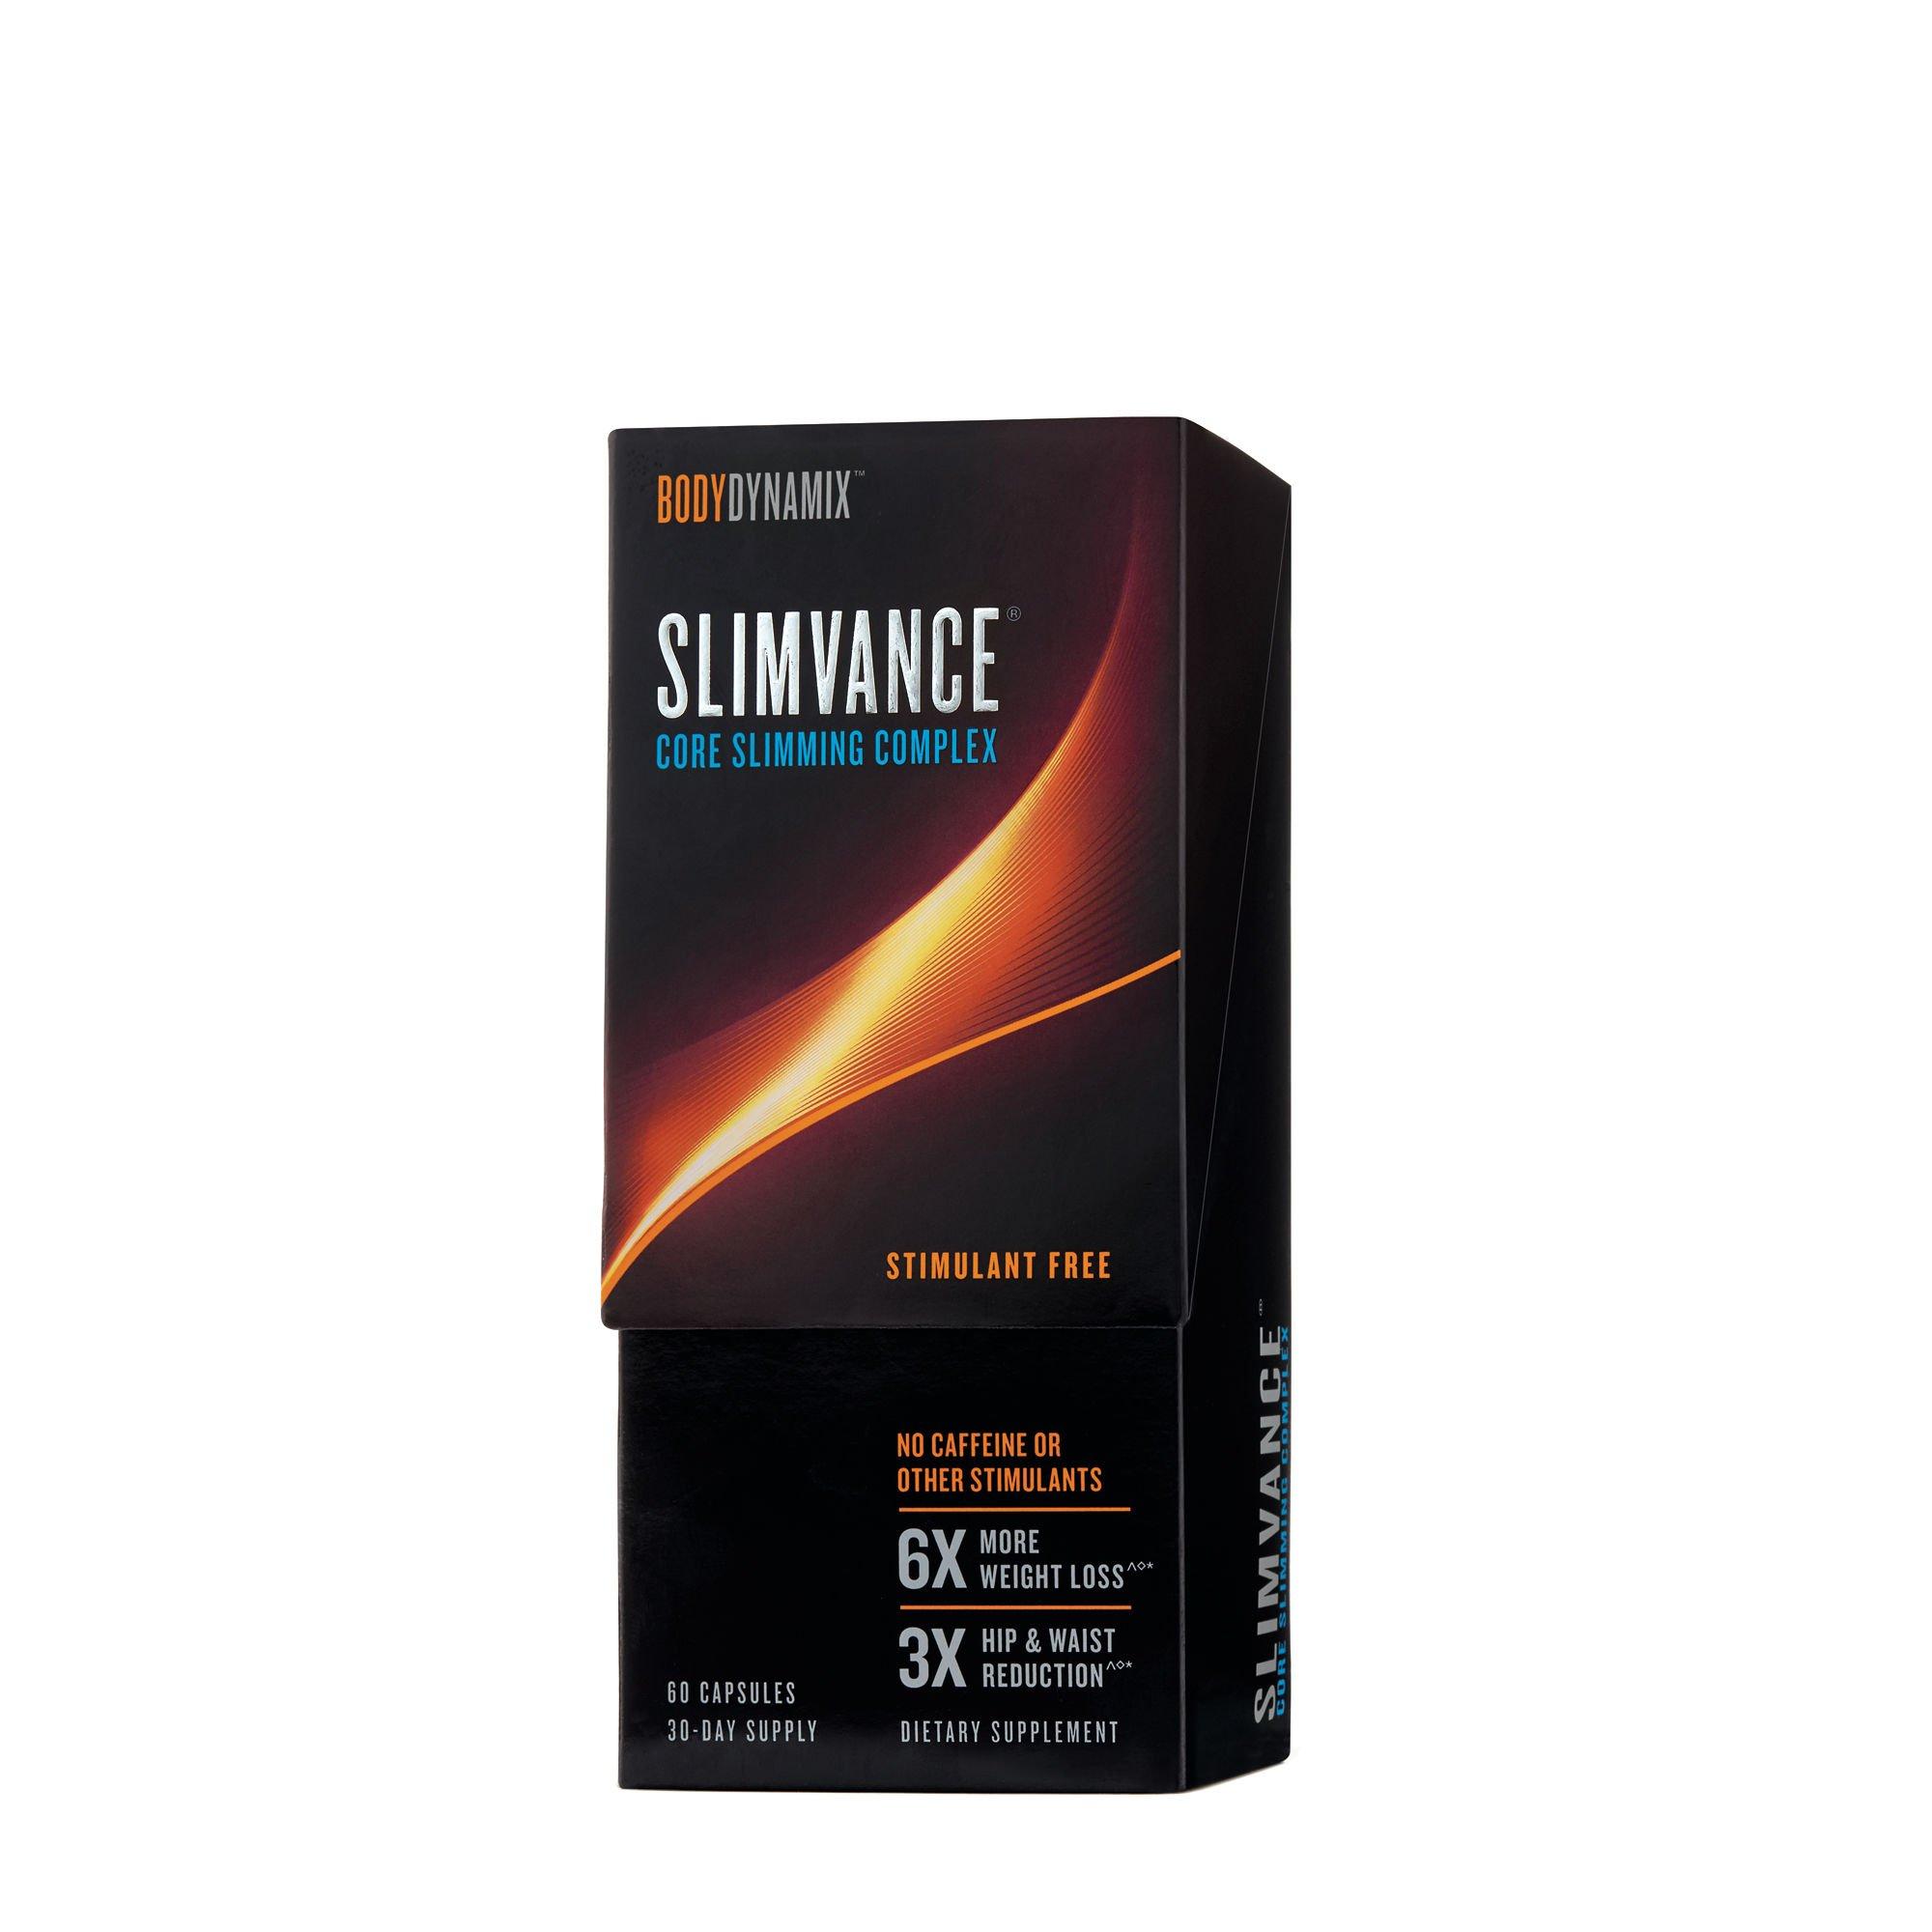 BodyDynamix Slimvance Core Slimming Complex Stimulant Free, 30 Day Supply by SLIMVANCE